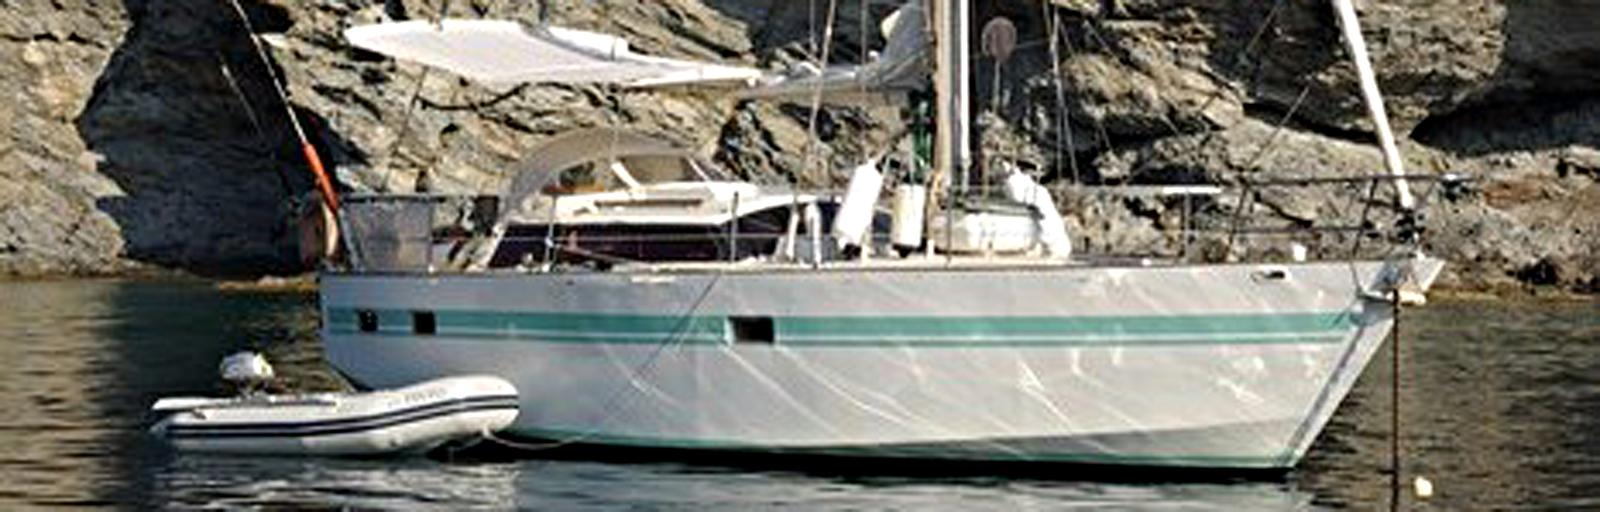 AYC Yachtbroker - Beaujolais